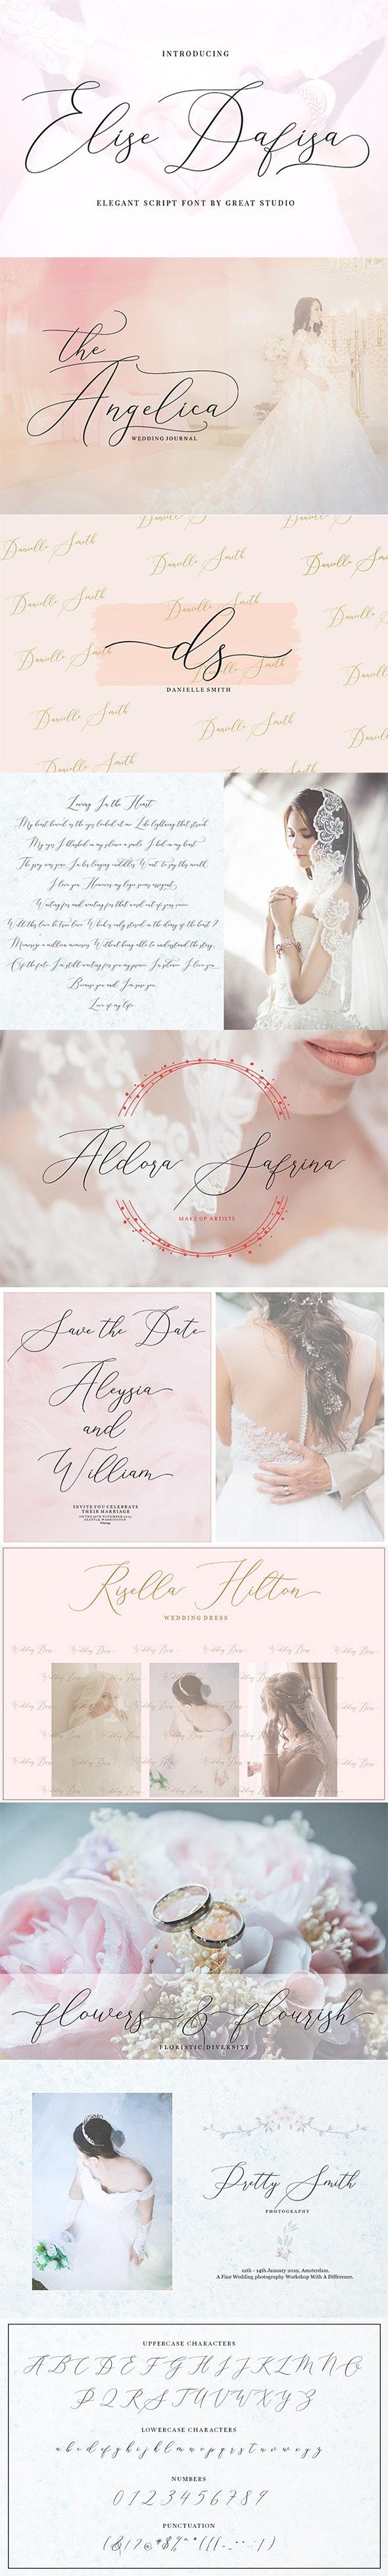 Elise Dafisa - Elegant Script Font - Calligraphy Script